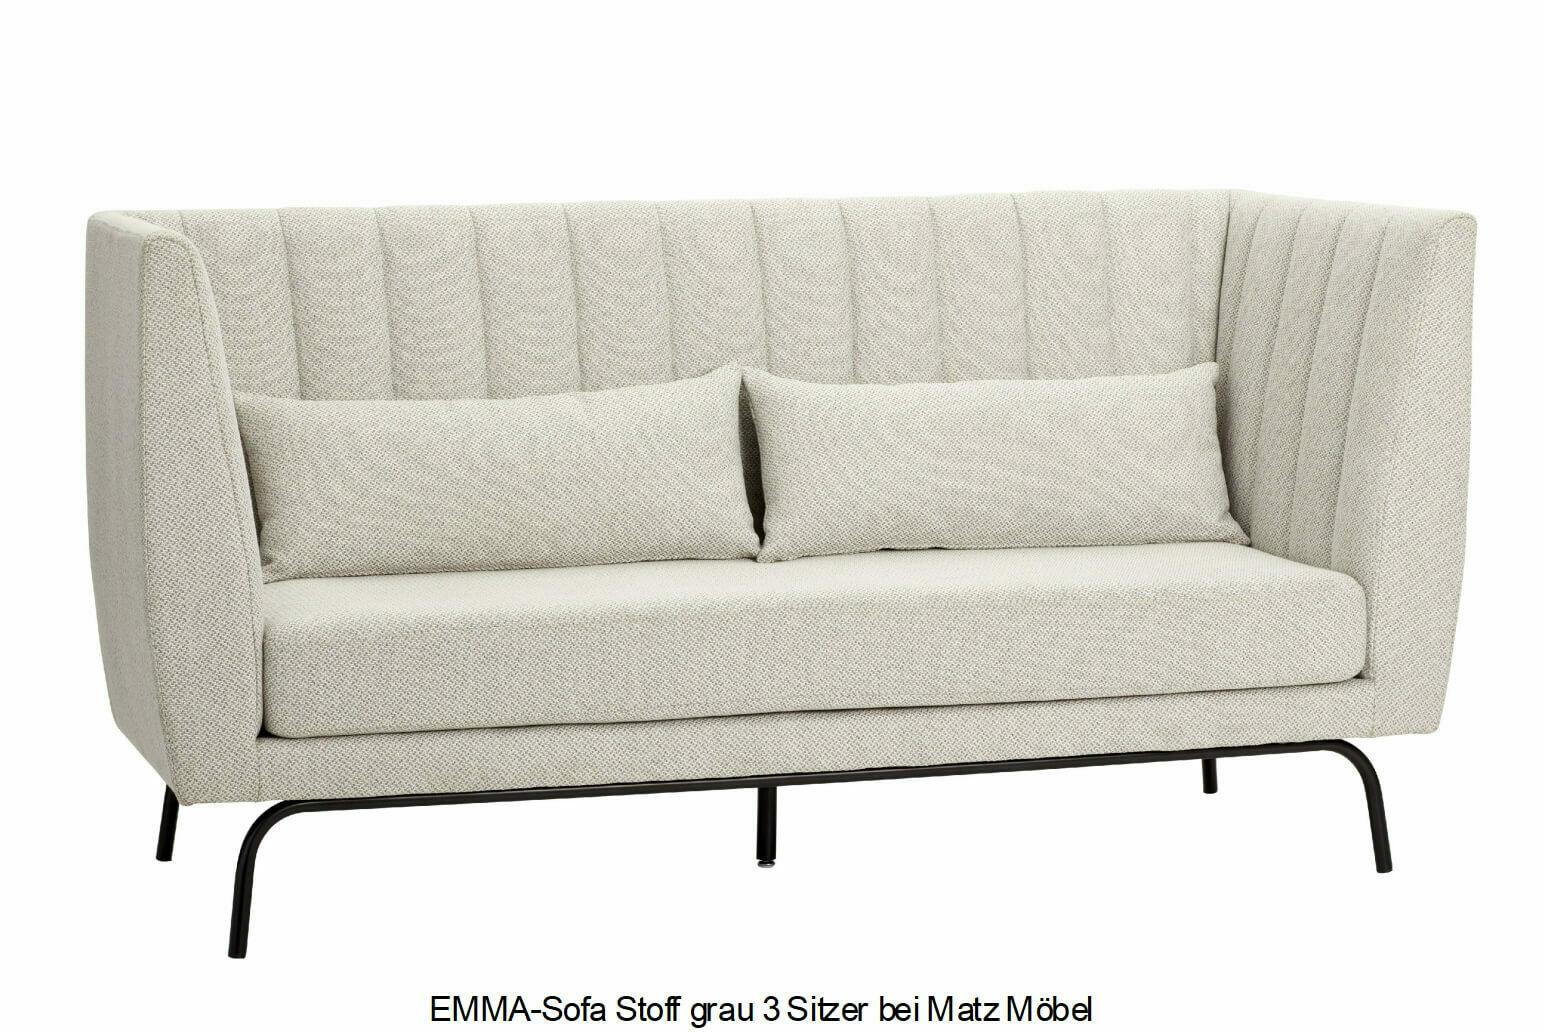 Full Size of Sofa 3 Sitzer Kamma Retro Couch Polstermbel Ohrensofa In Stoff L Form De Sede Ottomane Dreisitzer Groß Mit Bettfunktion Englisch Schillig Freistil Sofa Sofa 3 Sitzer